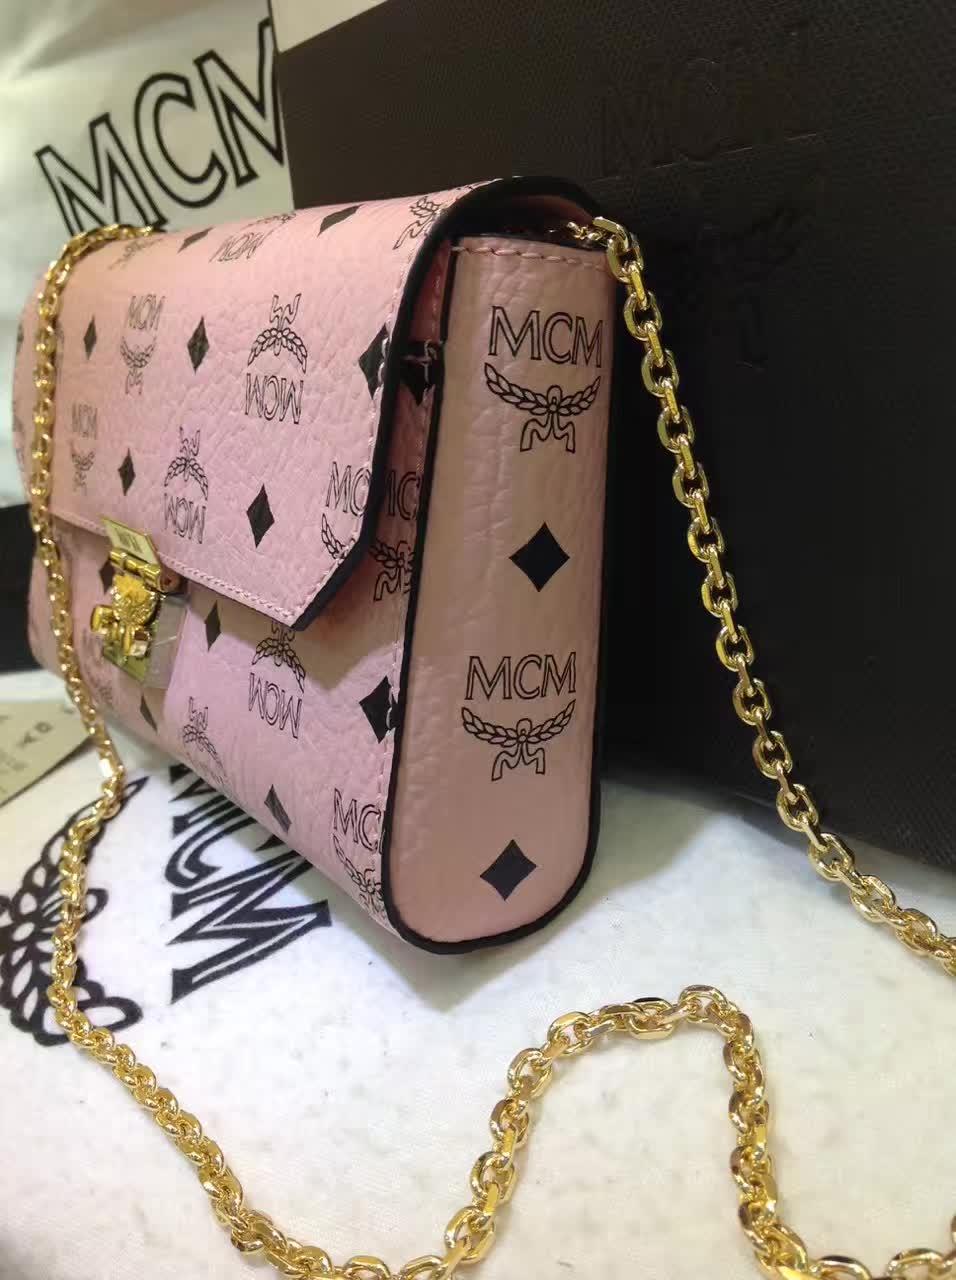 MCM官网同步 Visetos Patricia手袋 简约造型时尚优雅 冰激凌粉